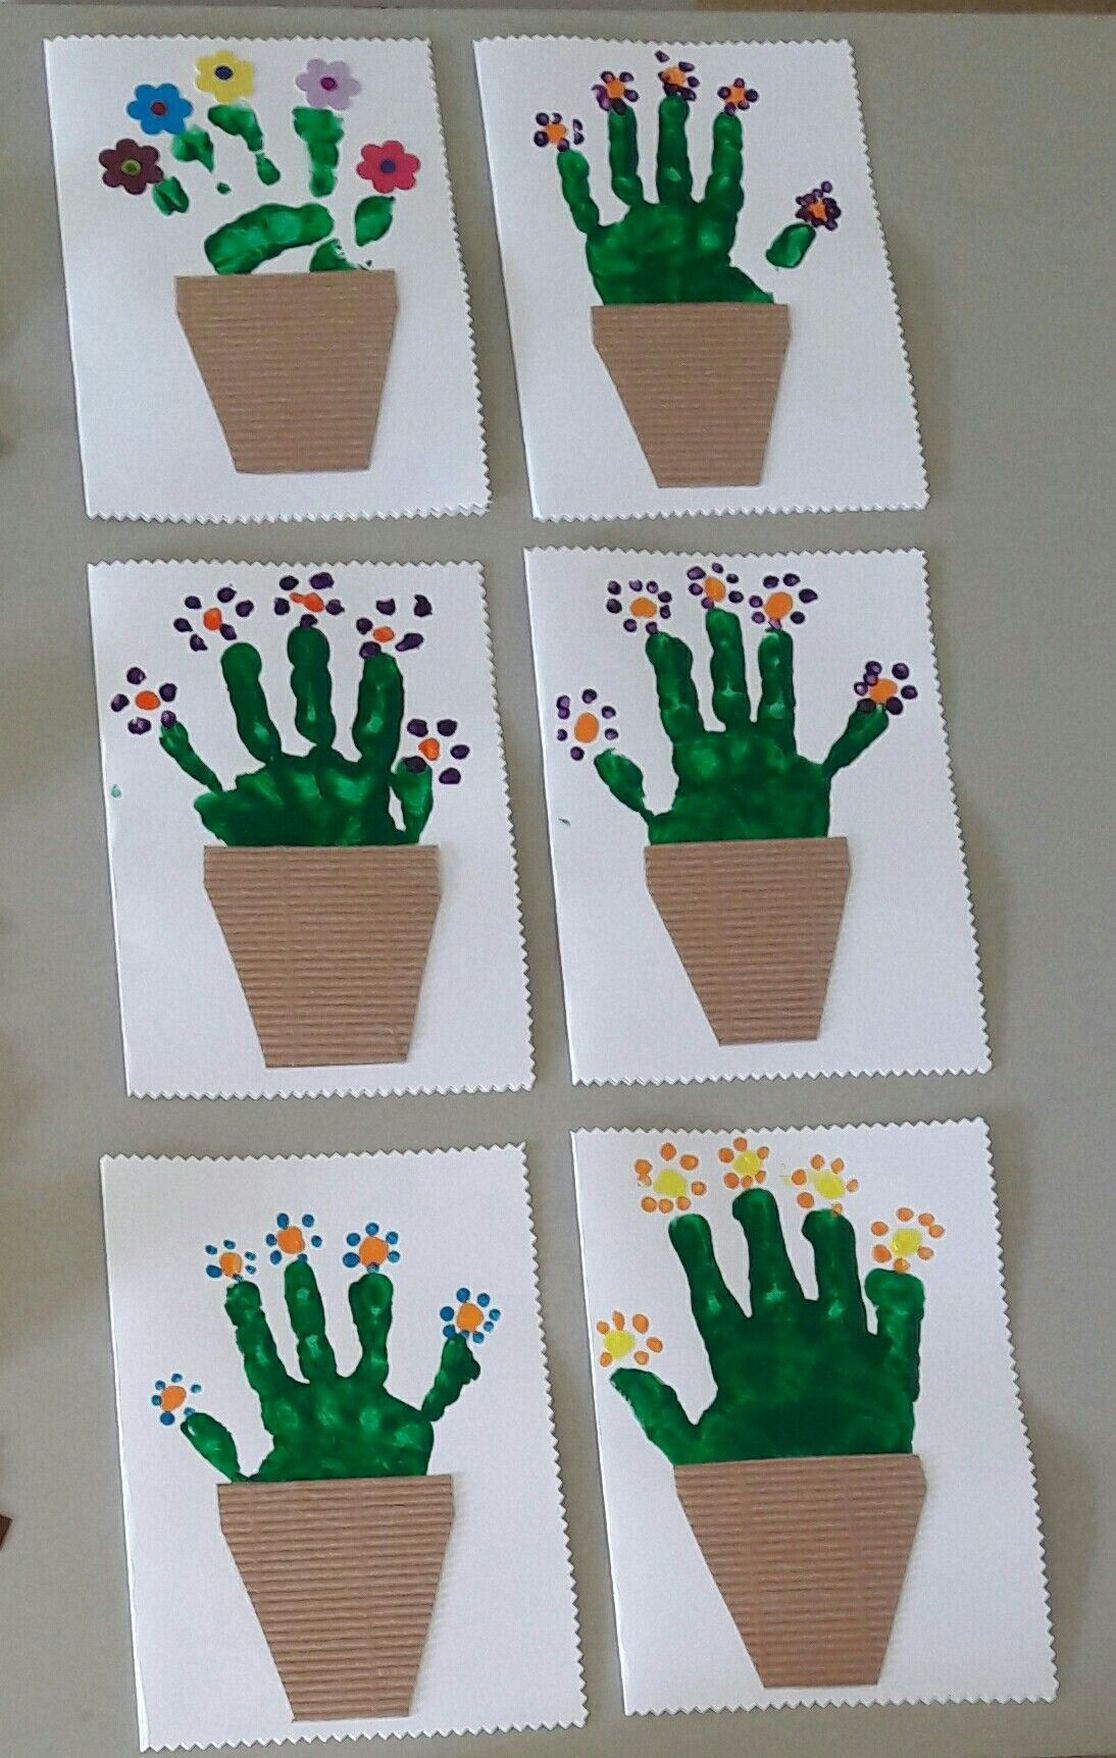 Preschool Spring Crafts Ideas  Spring crafts preschool creative art ideas 34